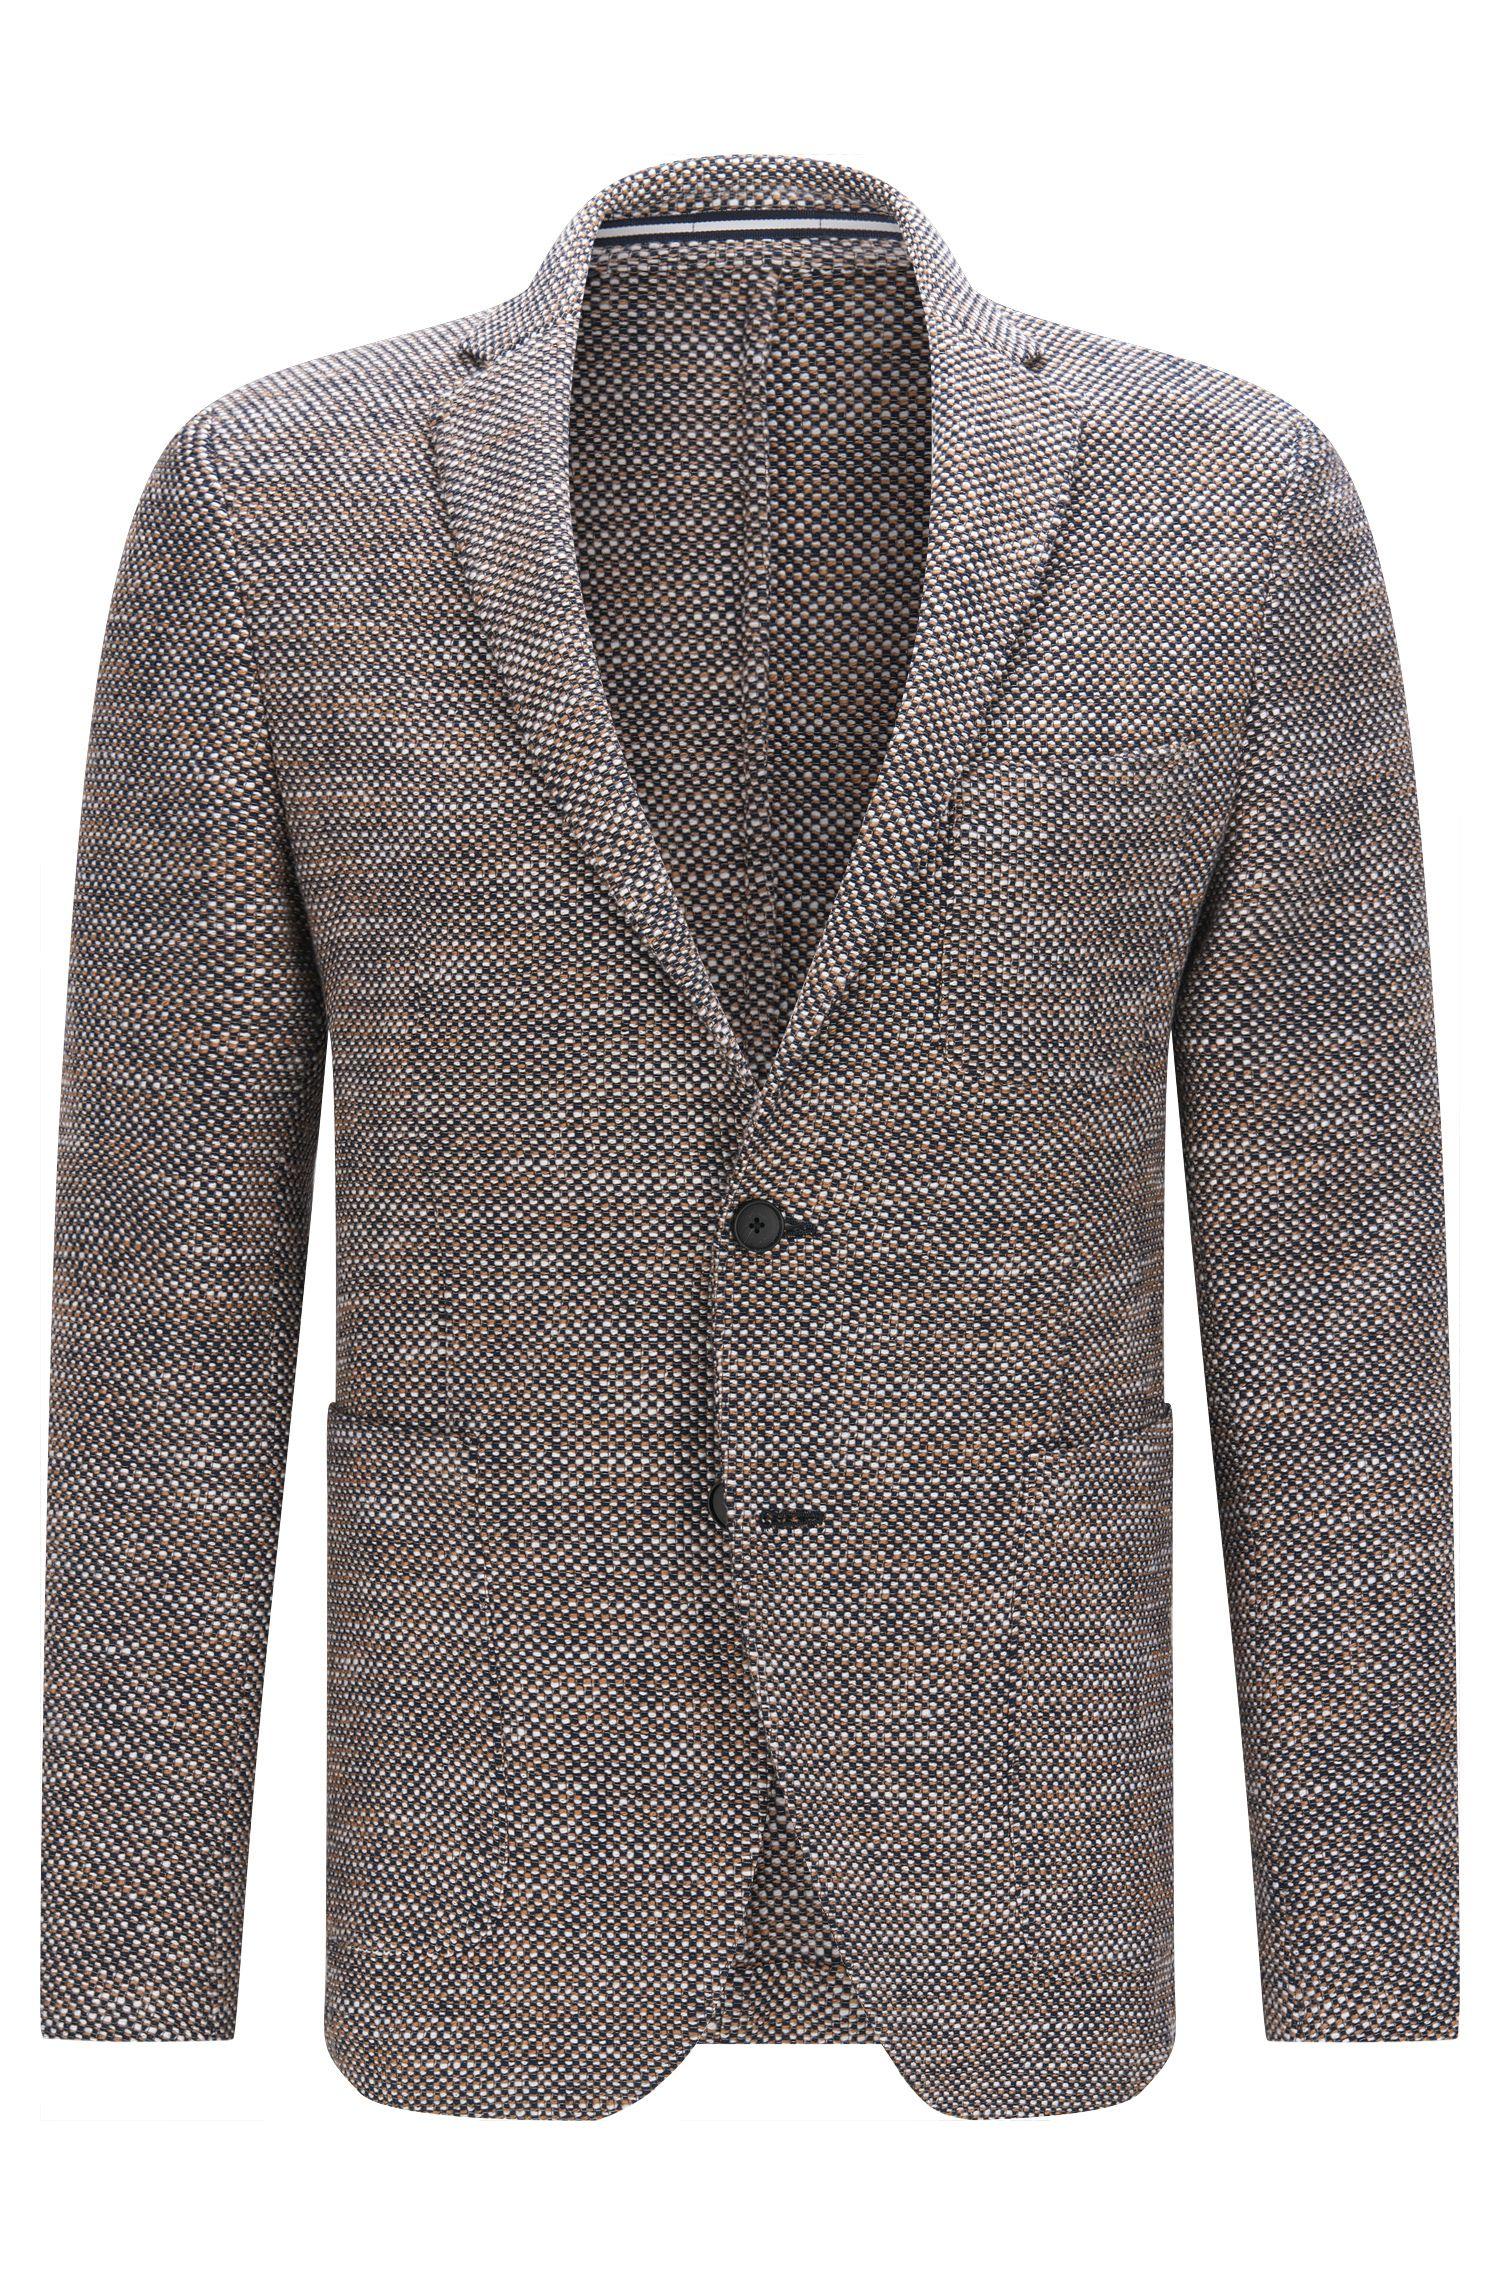 Cotton Blend Tweed Sport Coat, Slim Fit   Newon